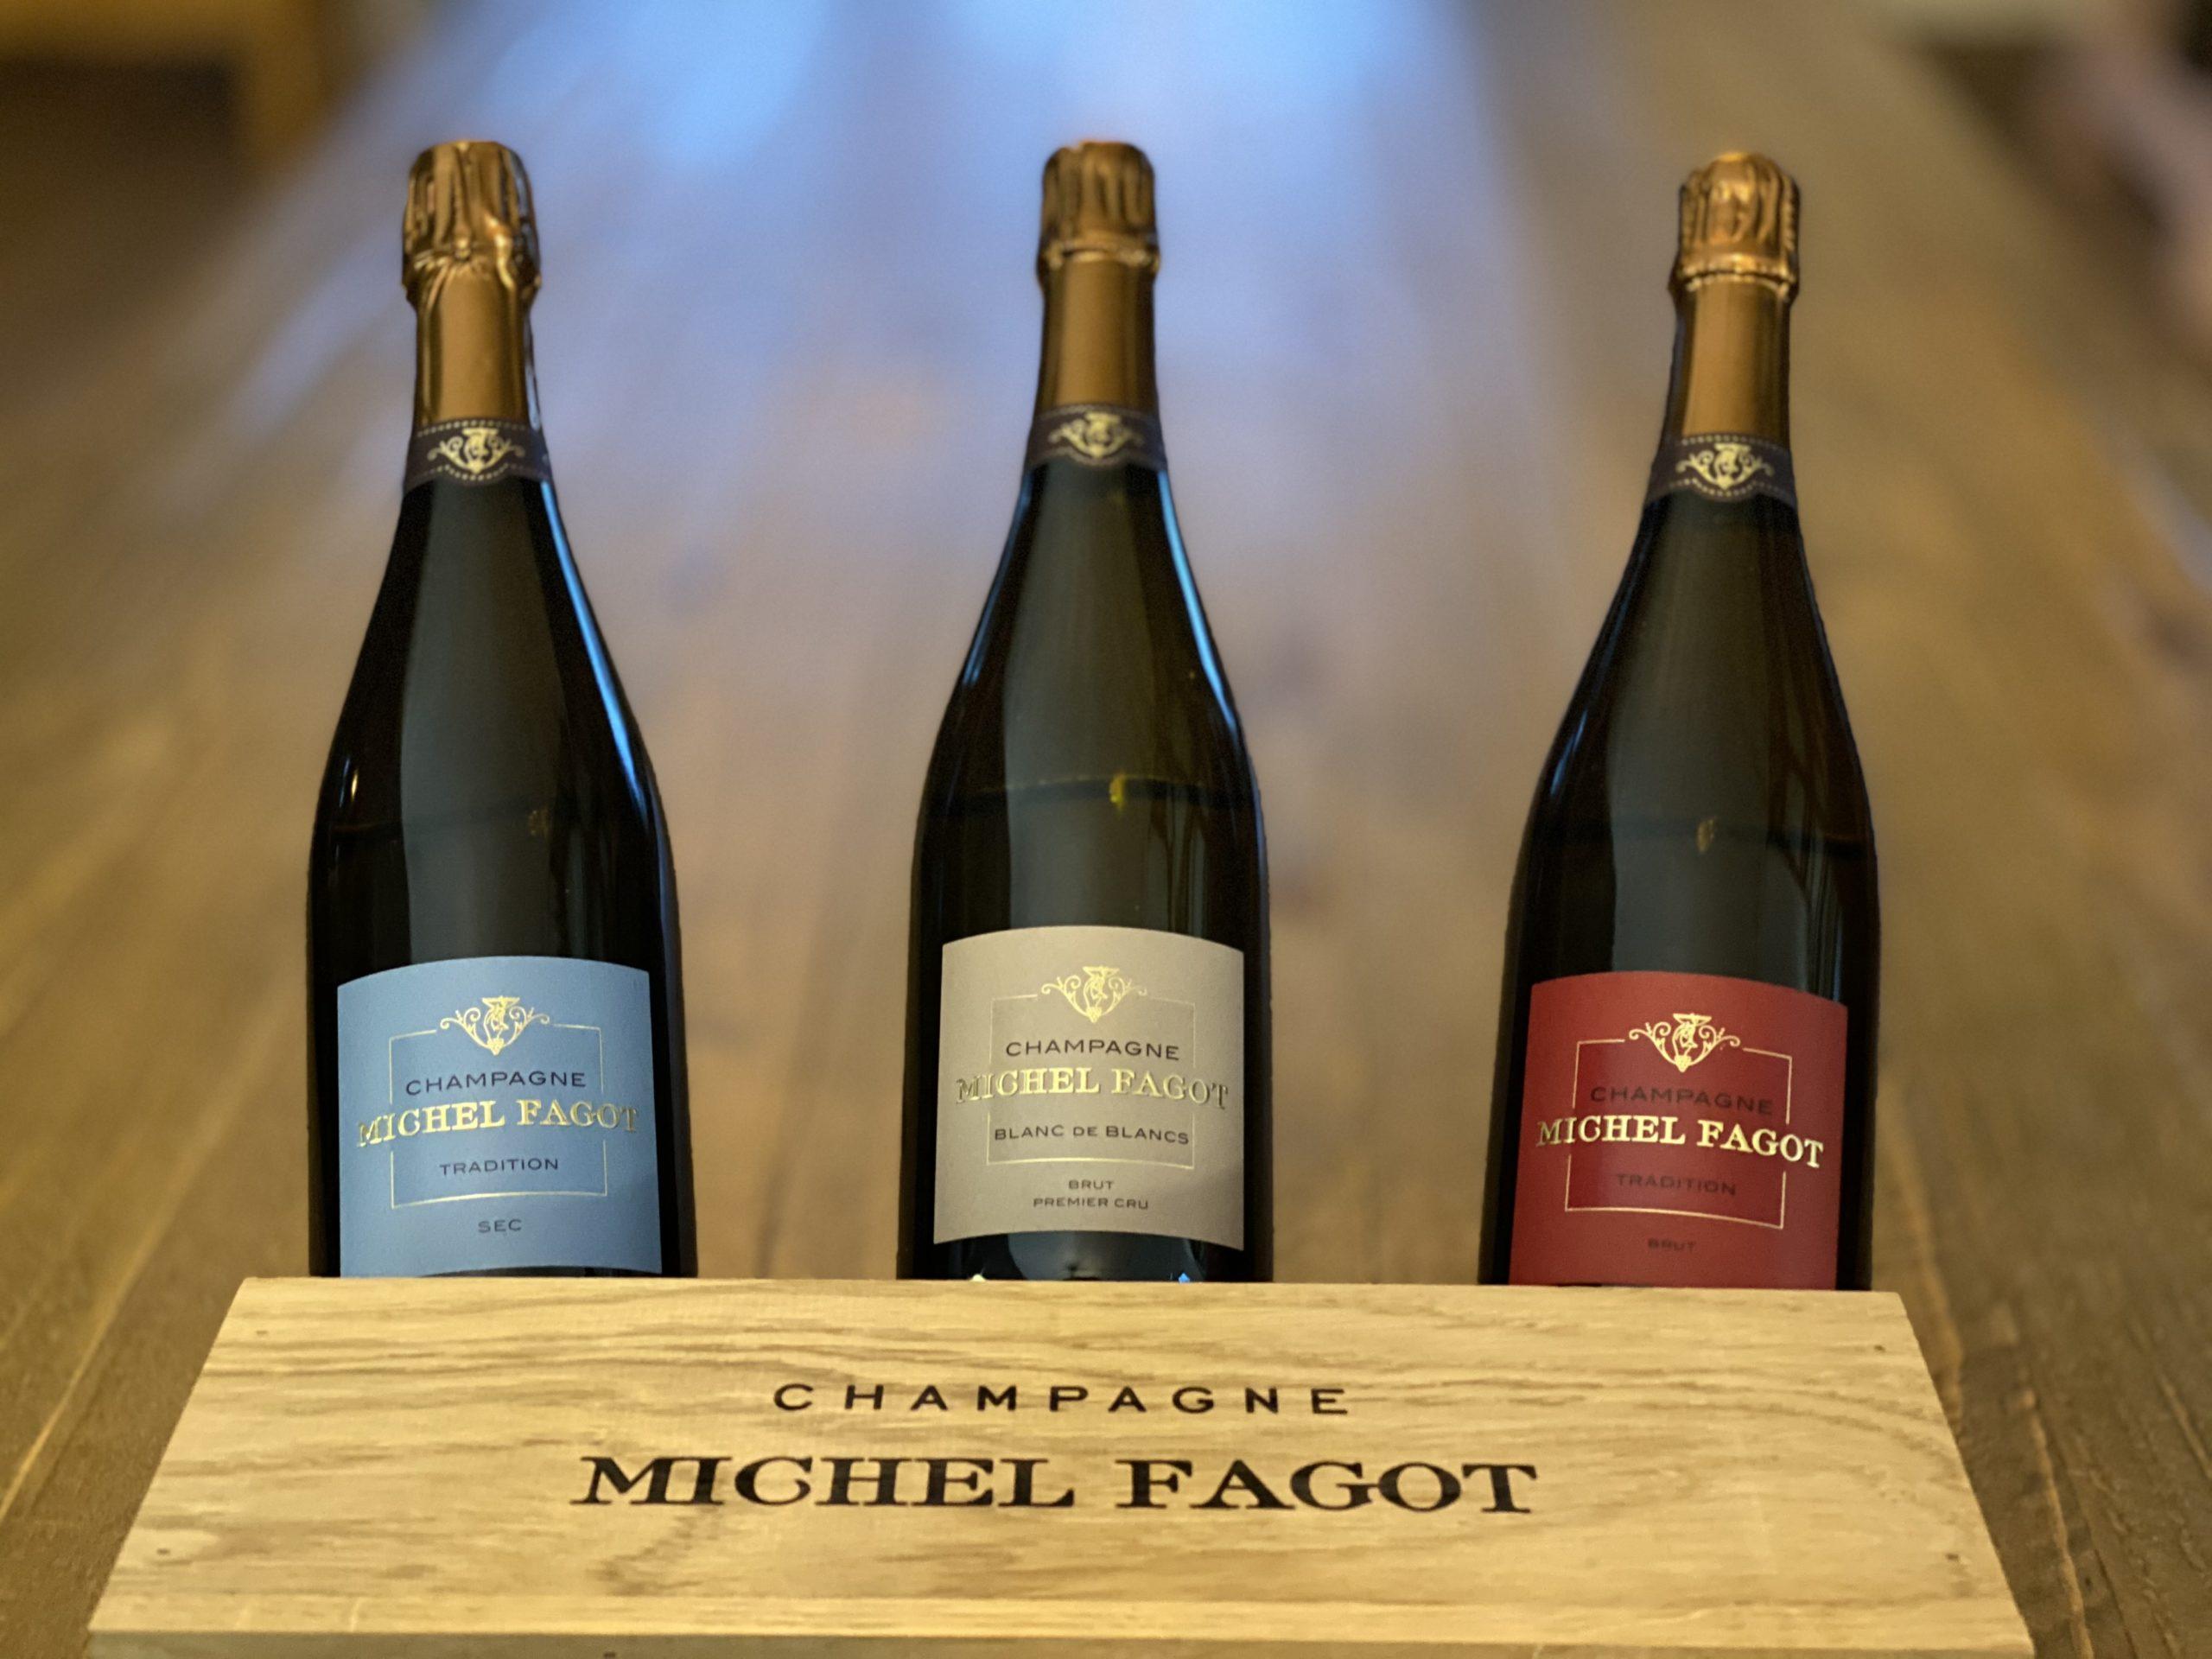 The Box Of House Michel Fagot